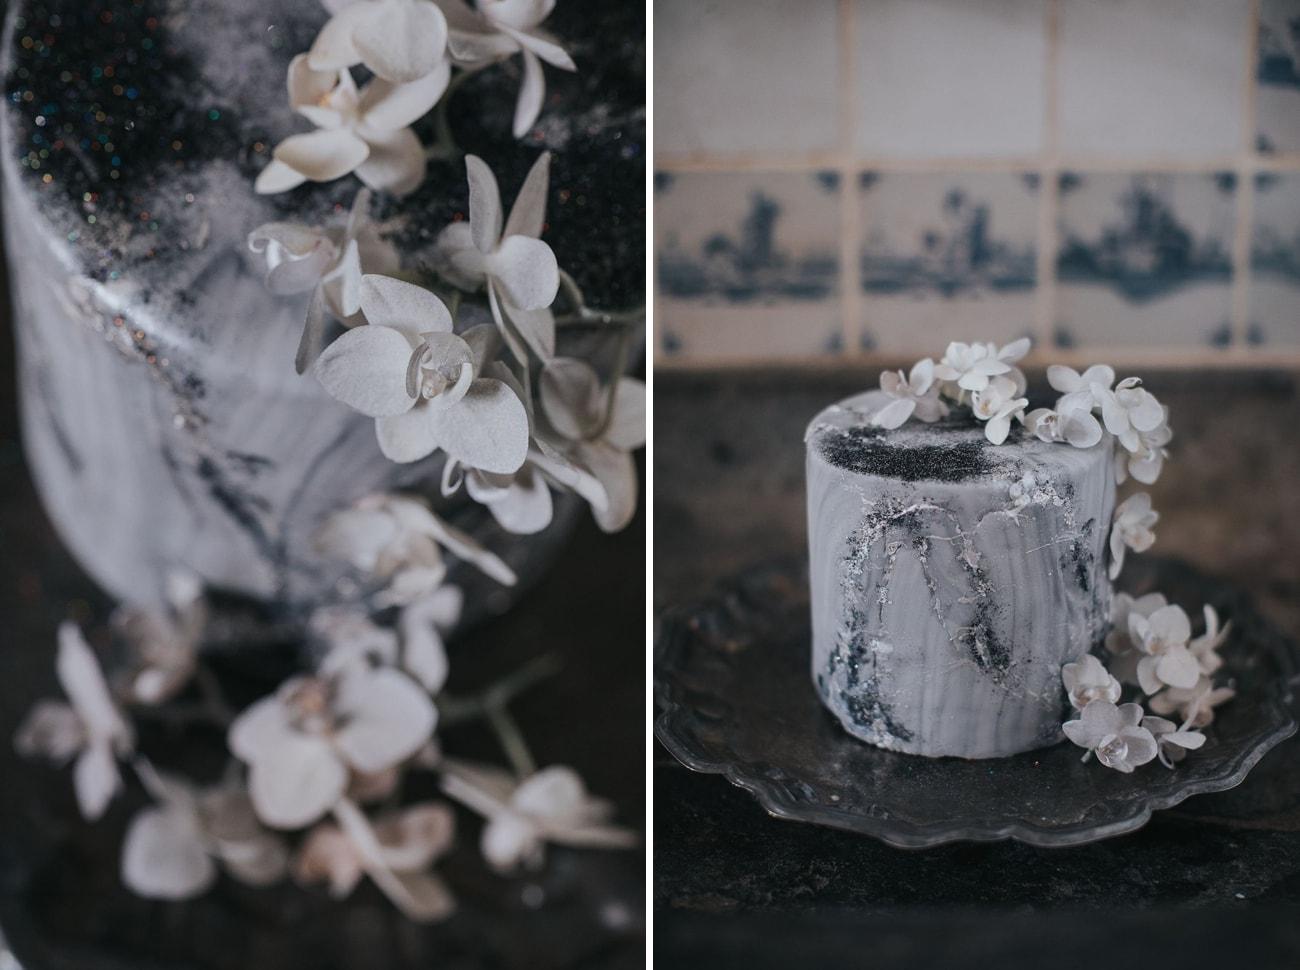 Silver Galaxy Wedding Cake | Credit: Cornelia Lietz